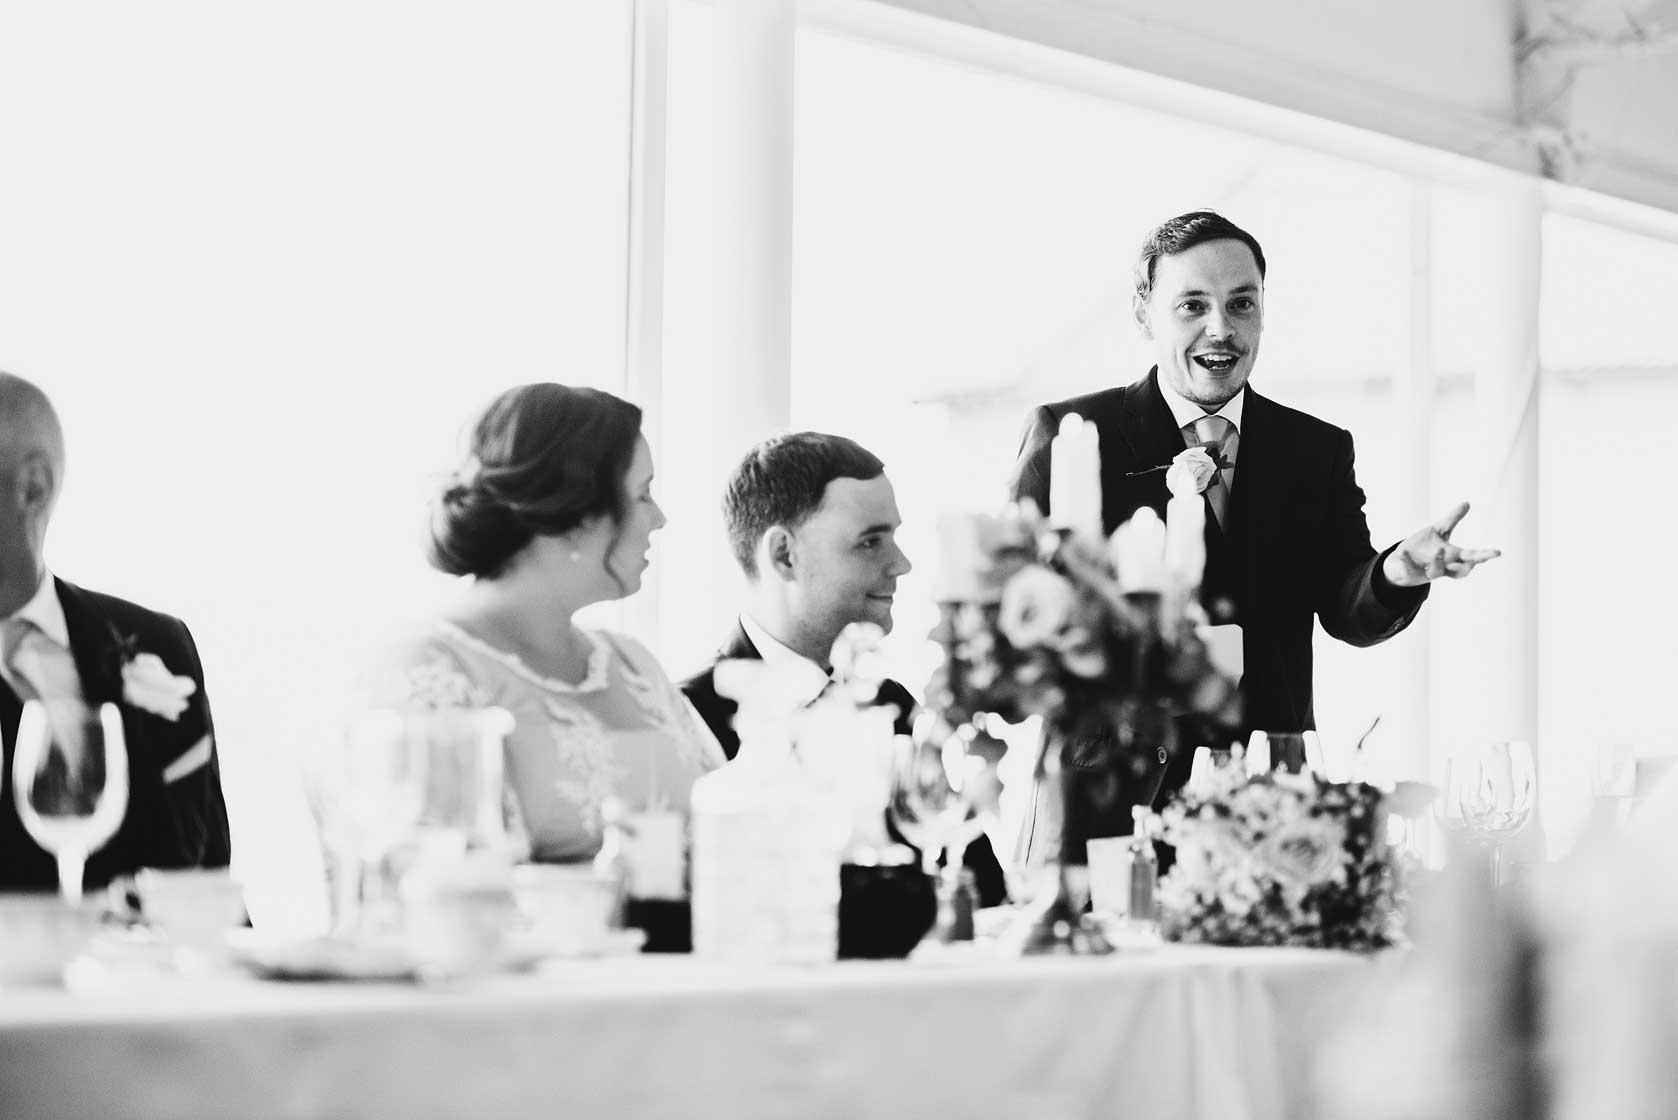 Reportage Wedding Photography at Crear